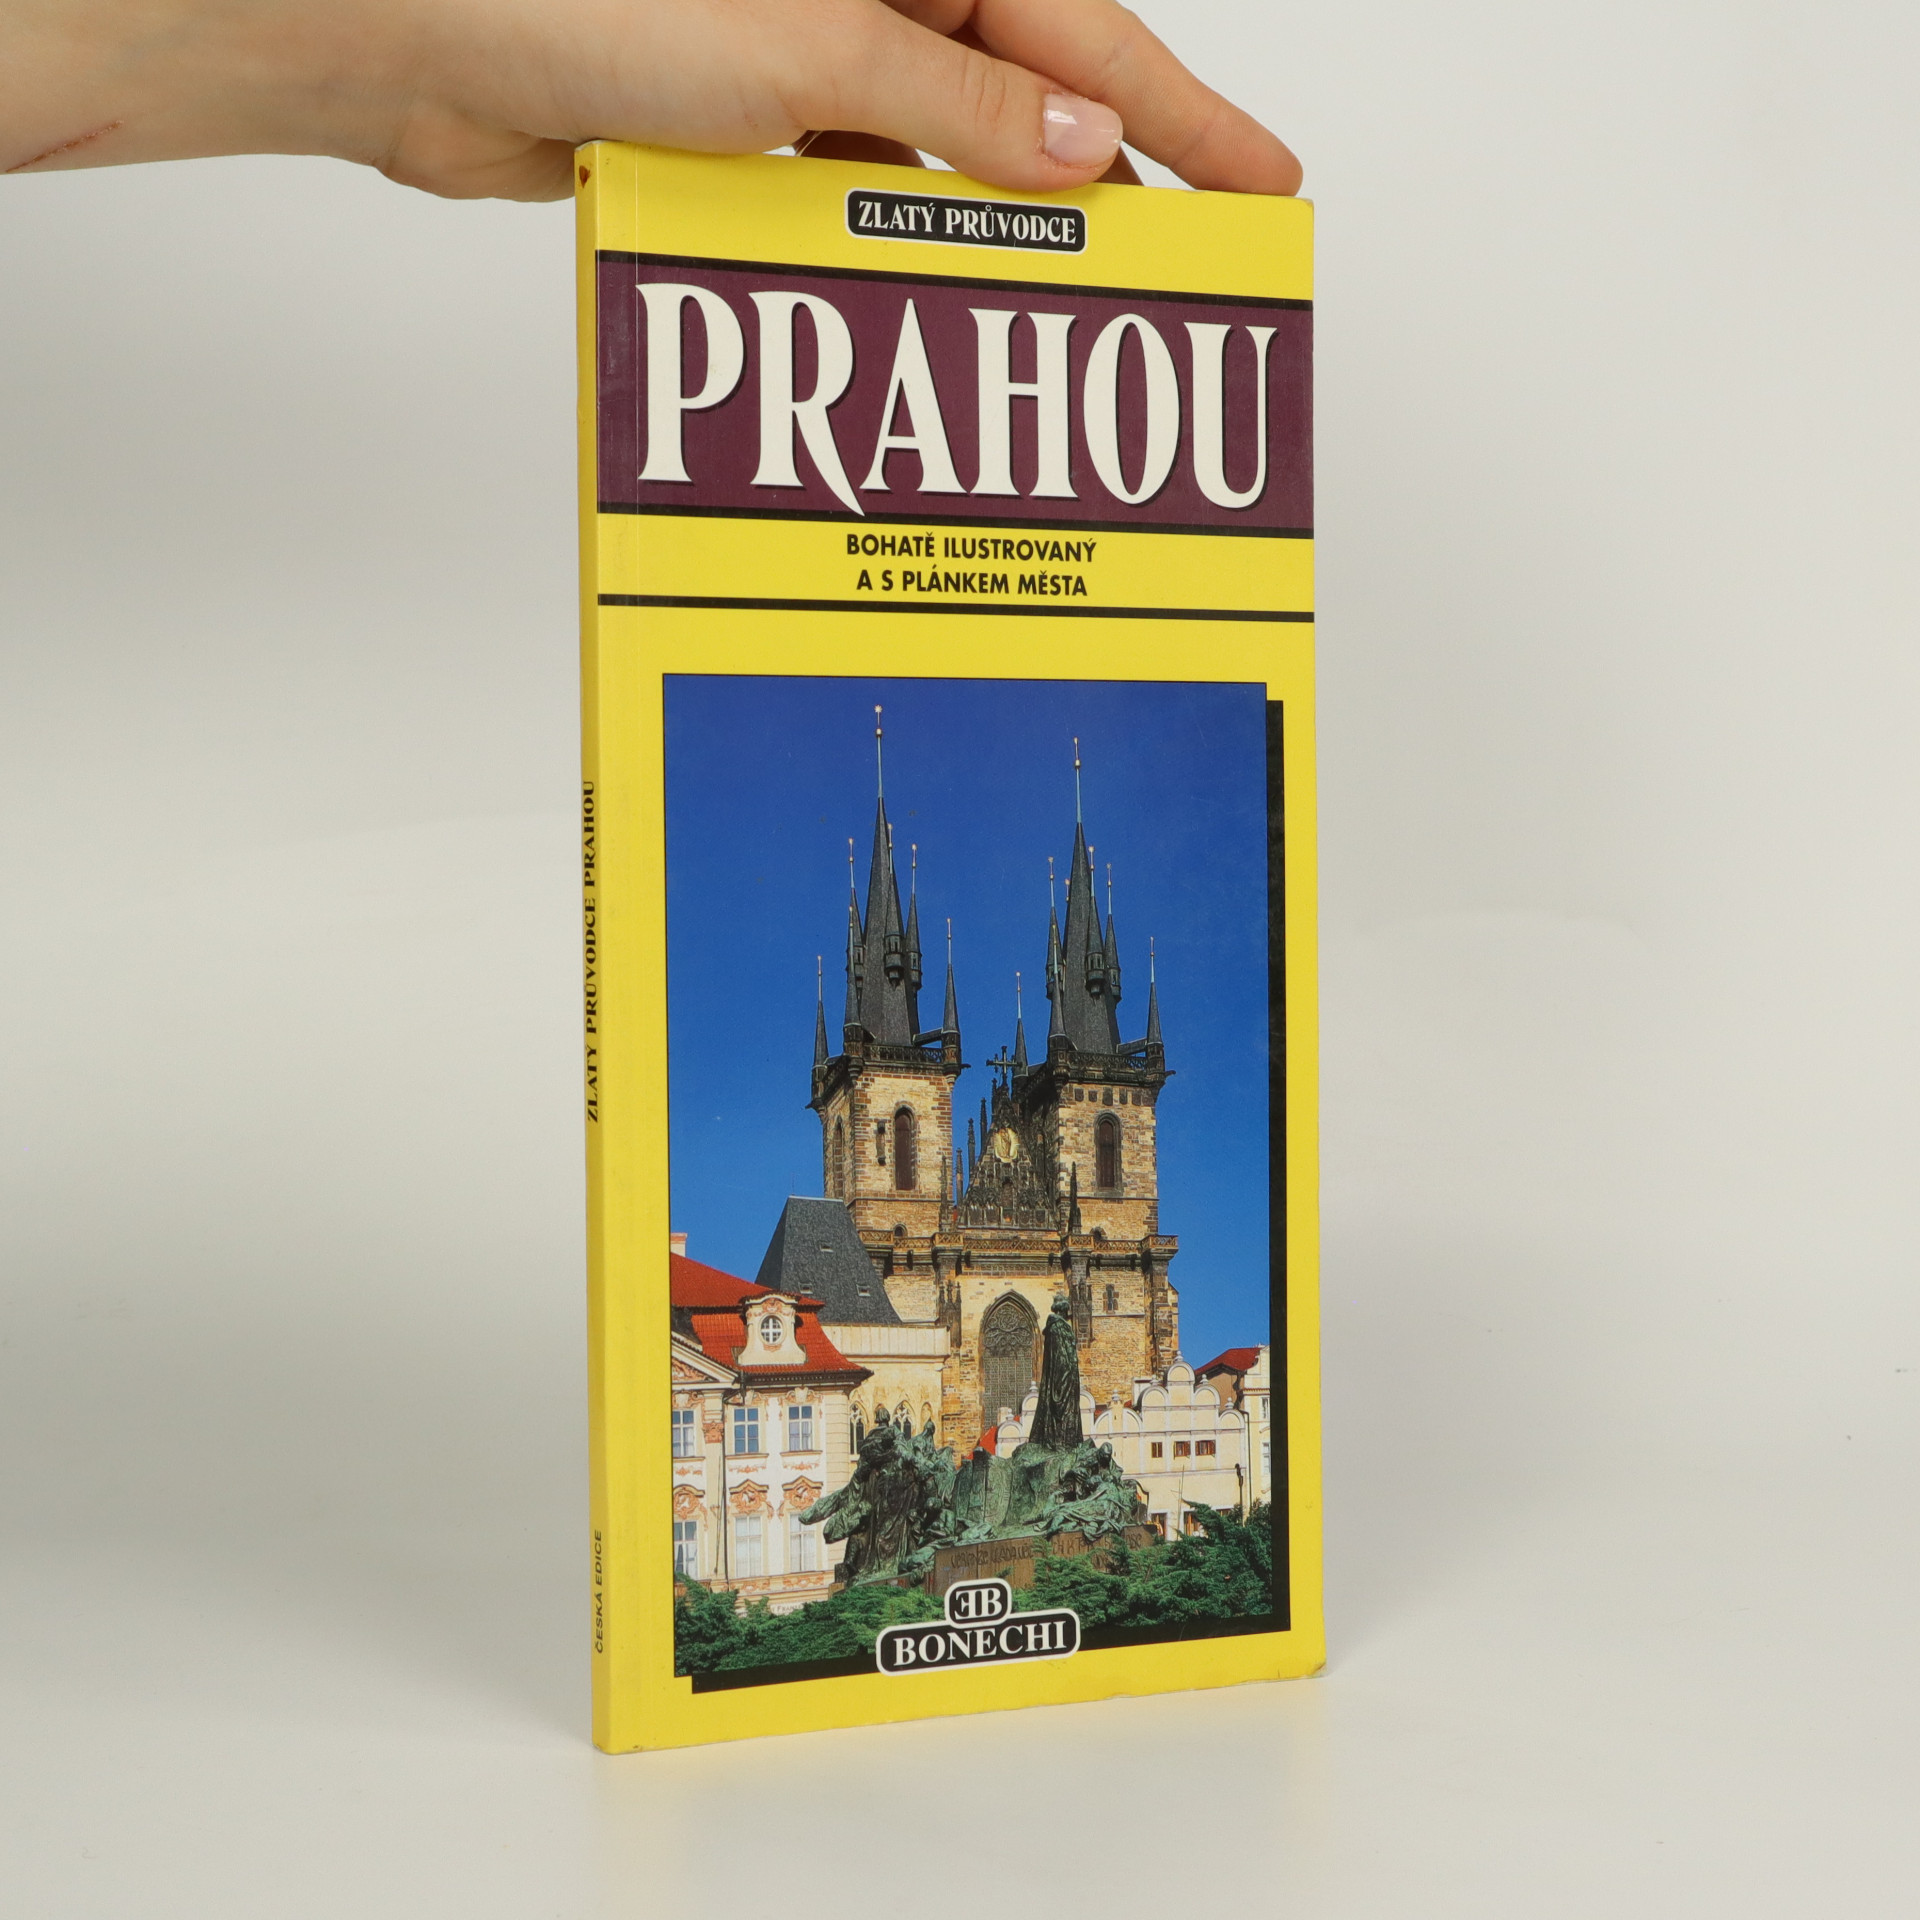 antikvární kniha Zlatý průvodce Prahou, 1997